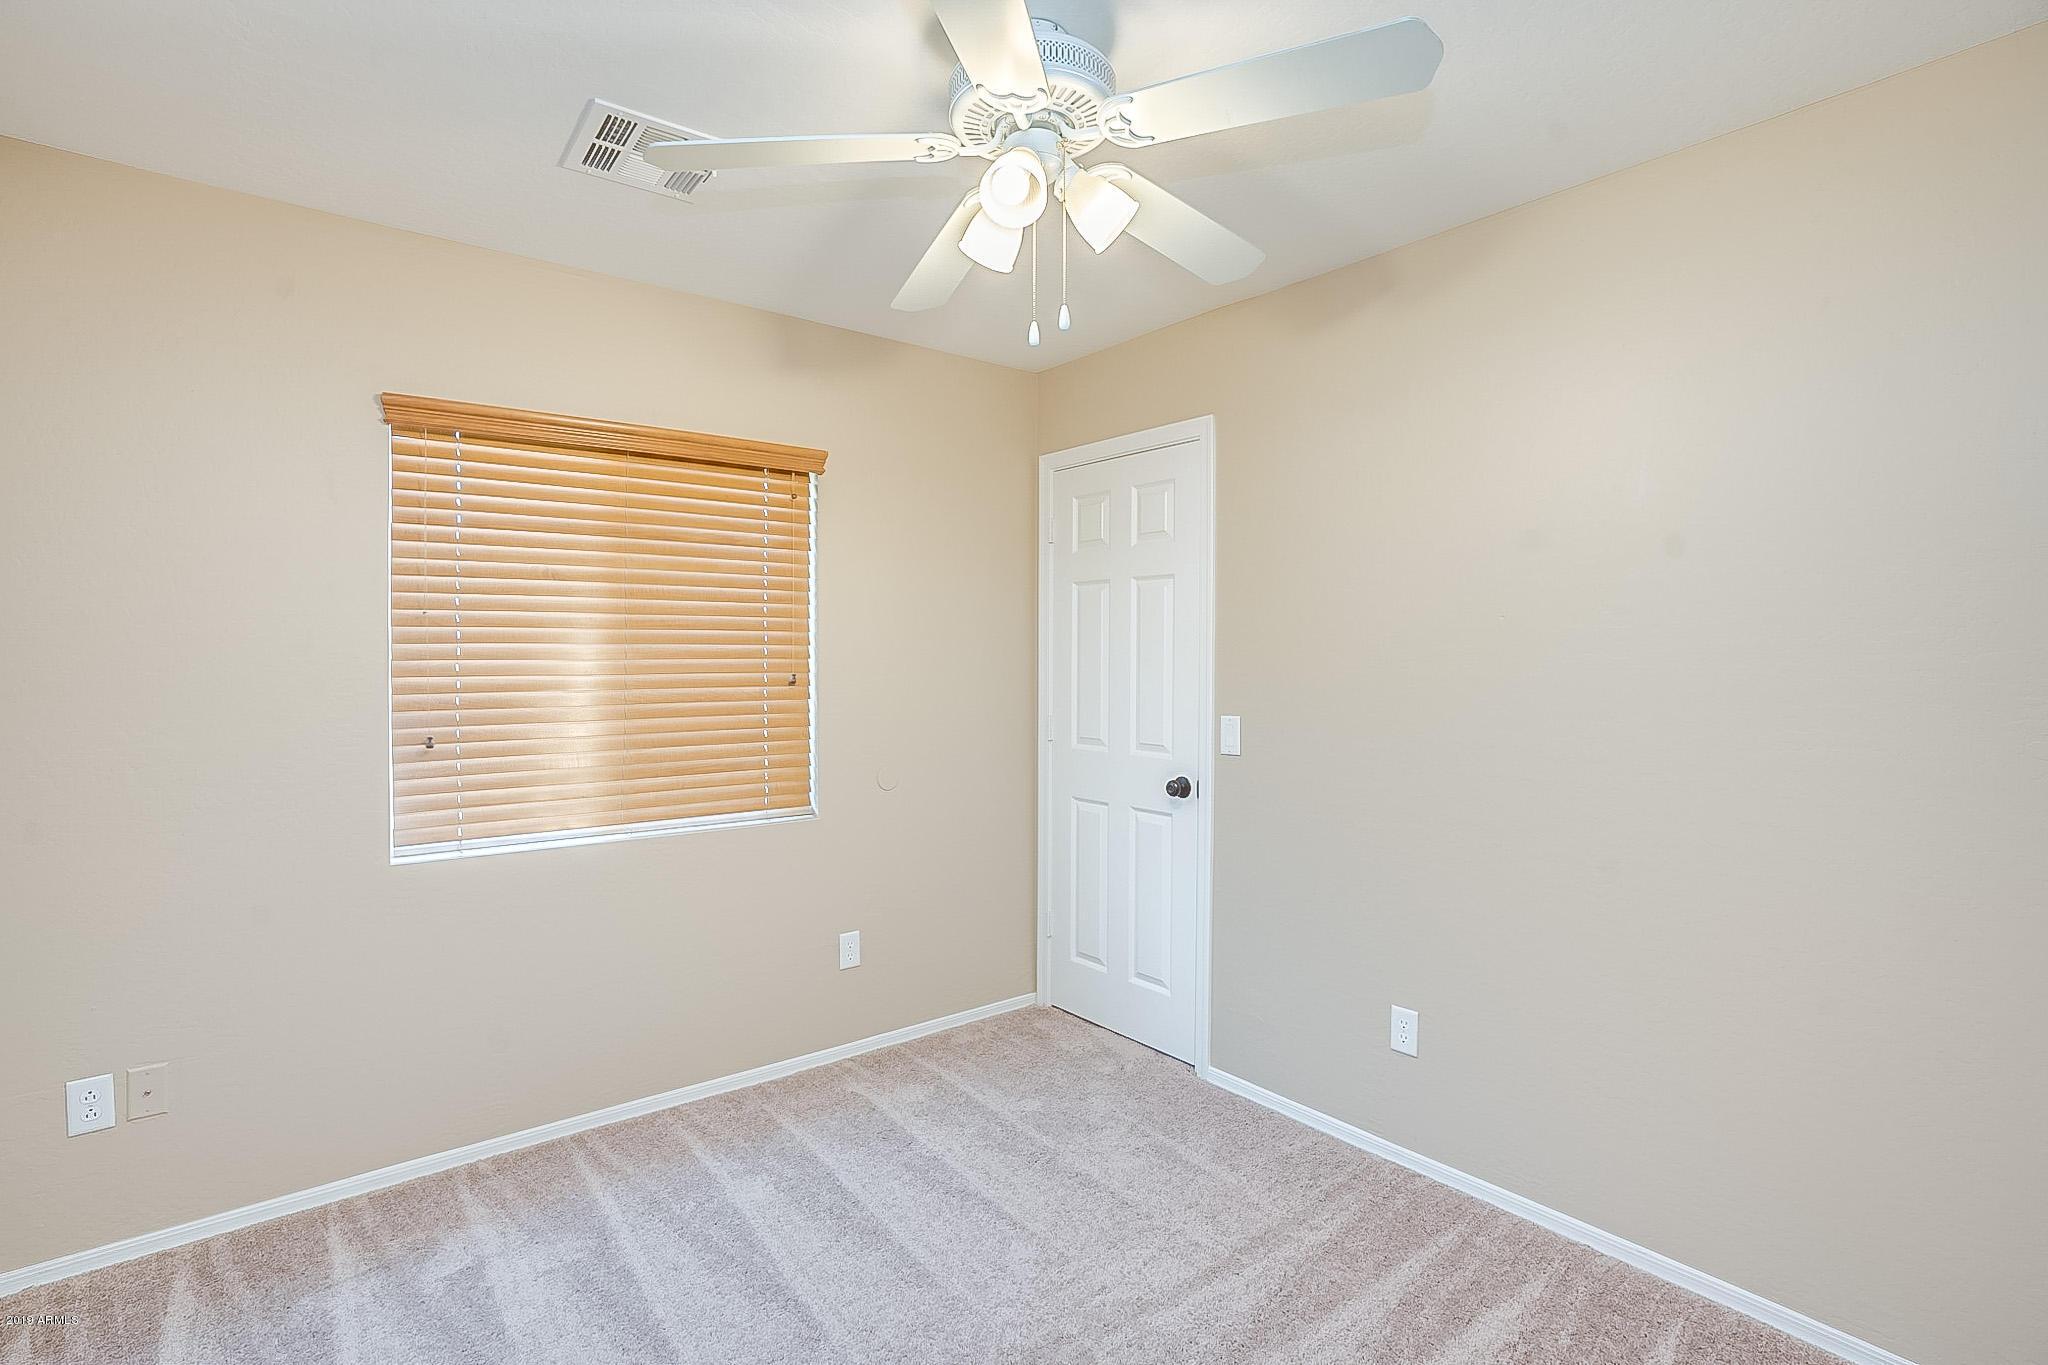 MLS 5952002 1706 W COOLIDGE Way, Coolidge, AZ 85128 Coolidge AZ Heartland